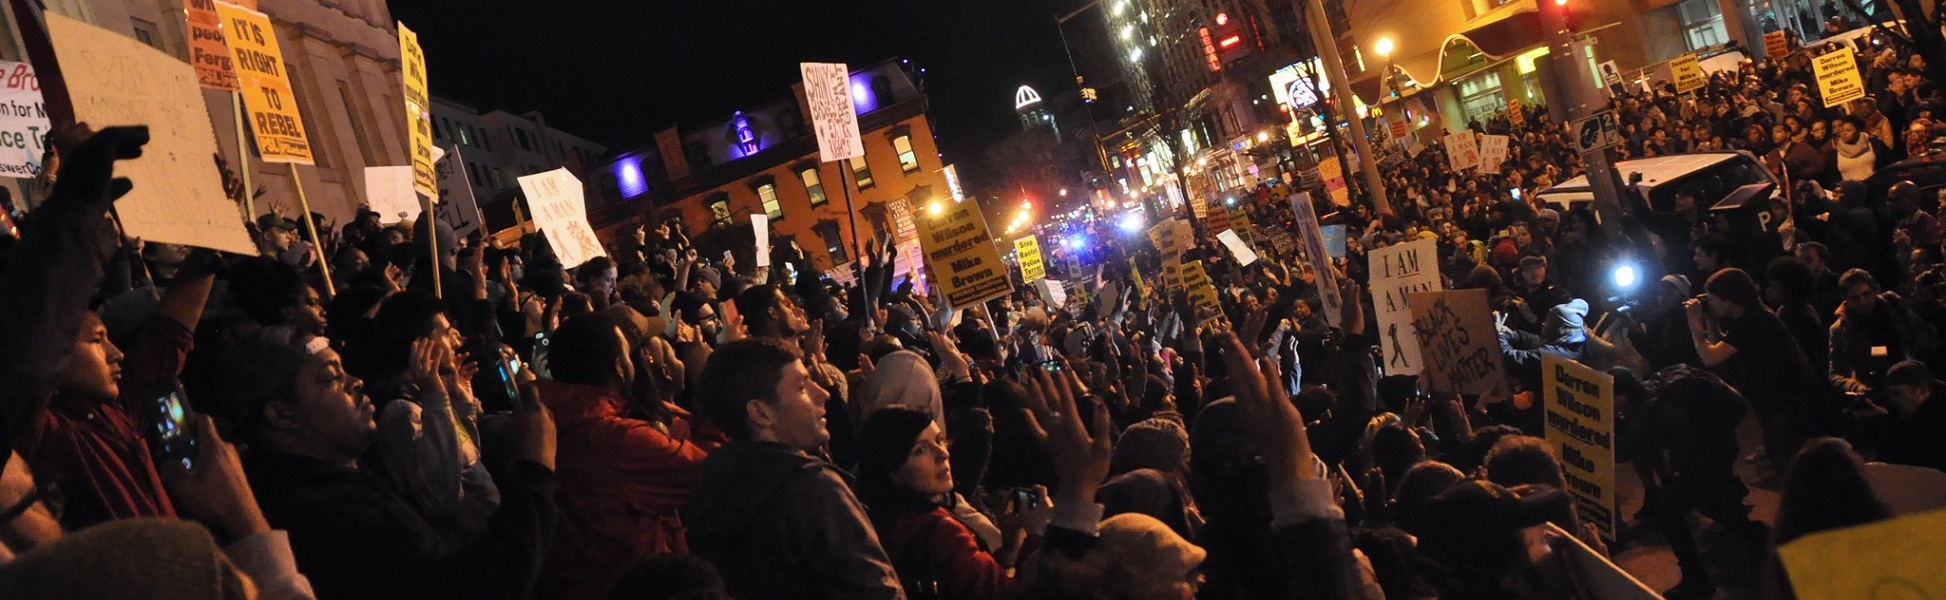 DC protest